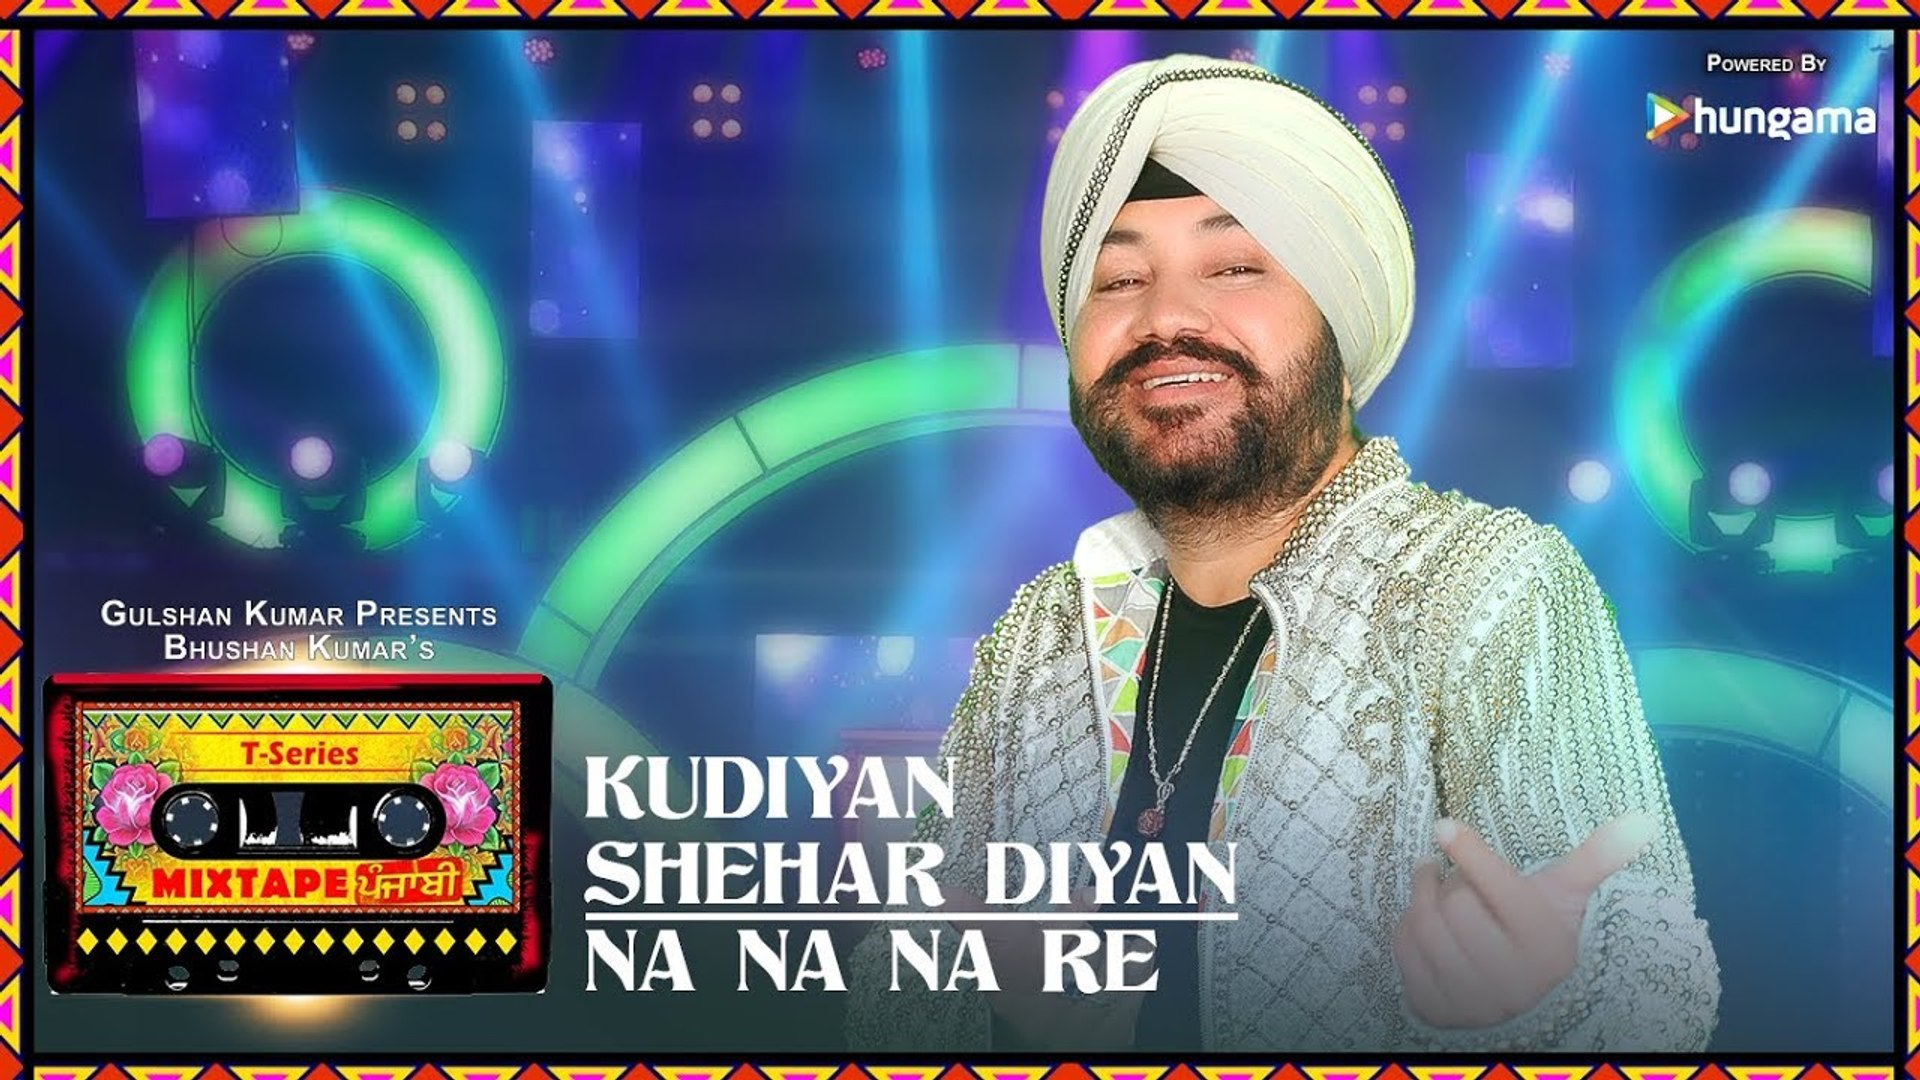 Kudiyaan Shehar DiyaanNa Na Na Re (Video) T-Series Mixtape Punjabi Daler Mehndi Bhushan Kumar